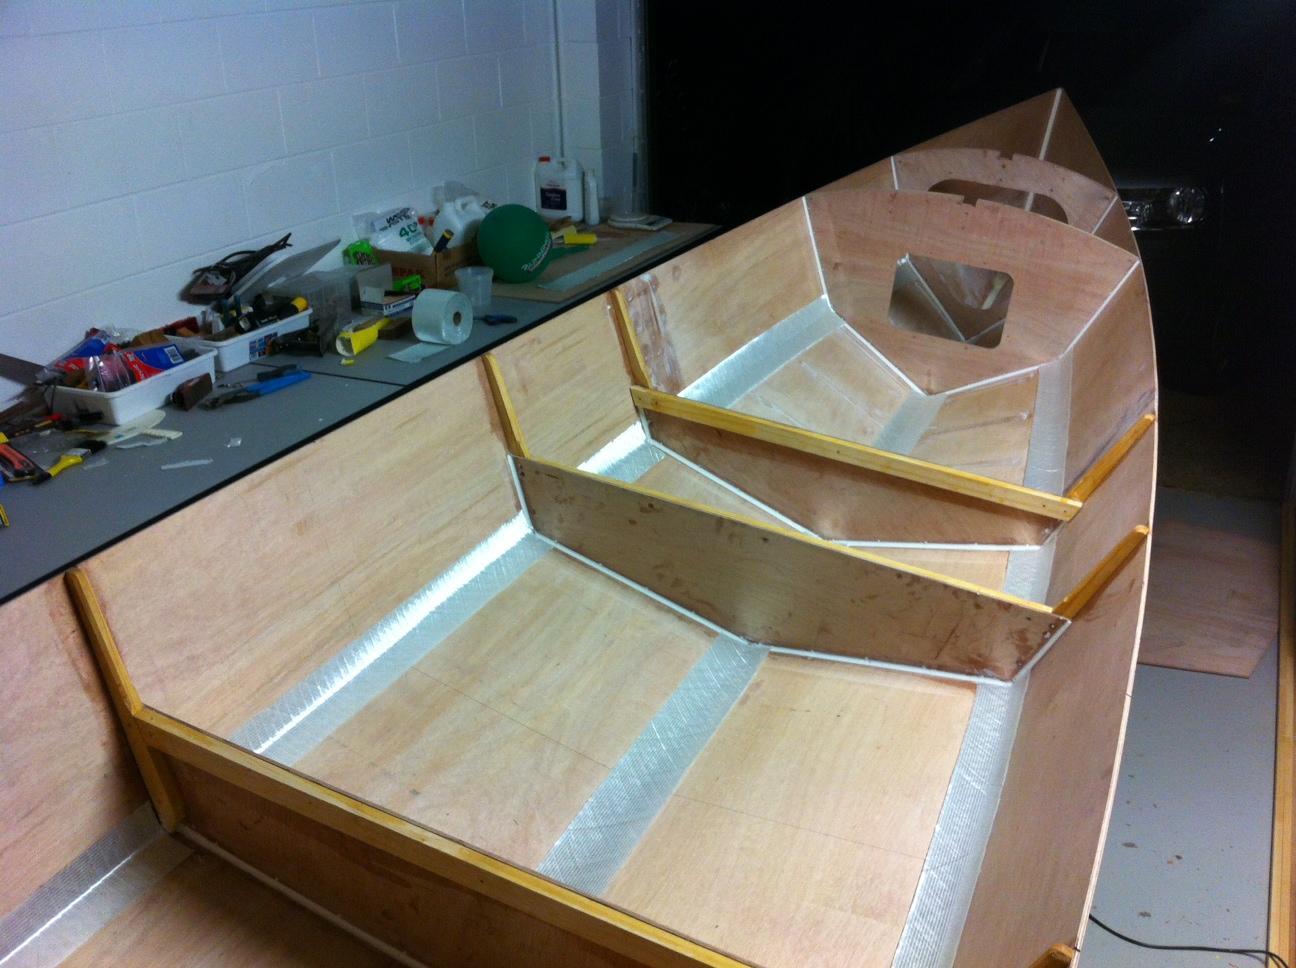 Ross Lillistone Wooden Boats: August 2012